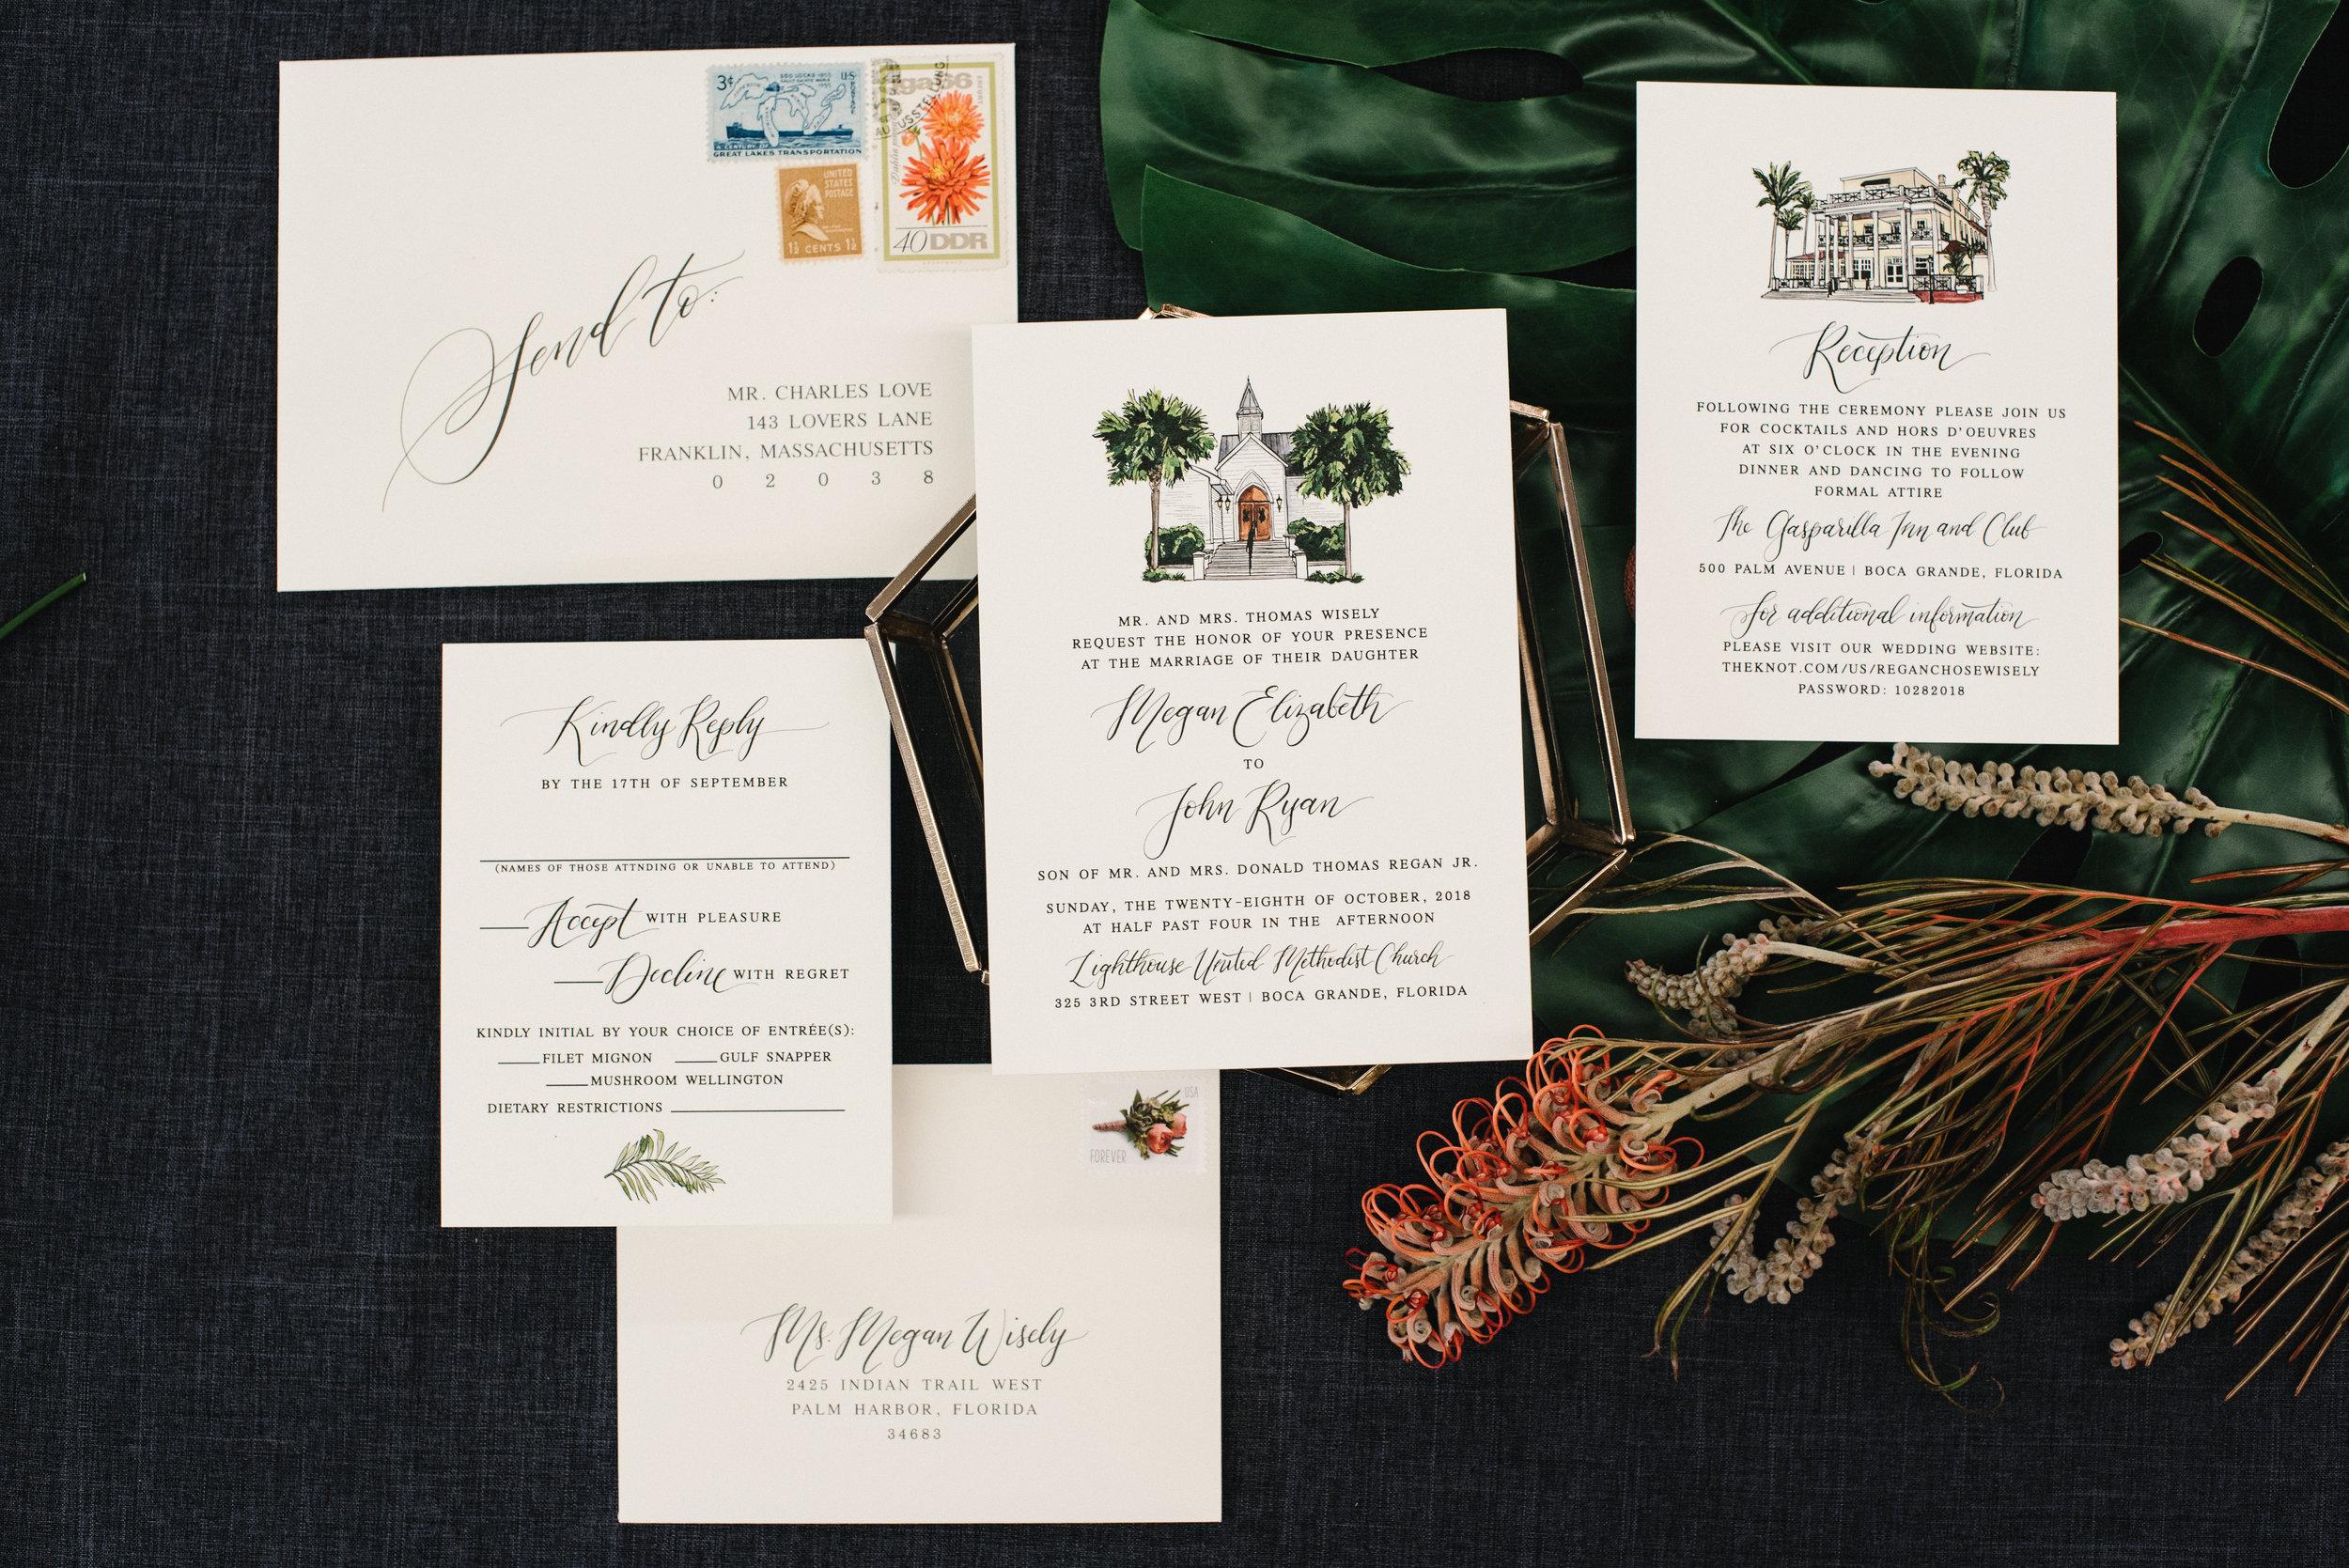 BOCA GRANDE GASPARILLA INN WATERCOLOR WEDDING INVITATIONS